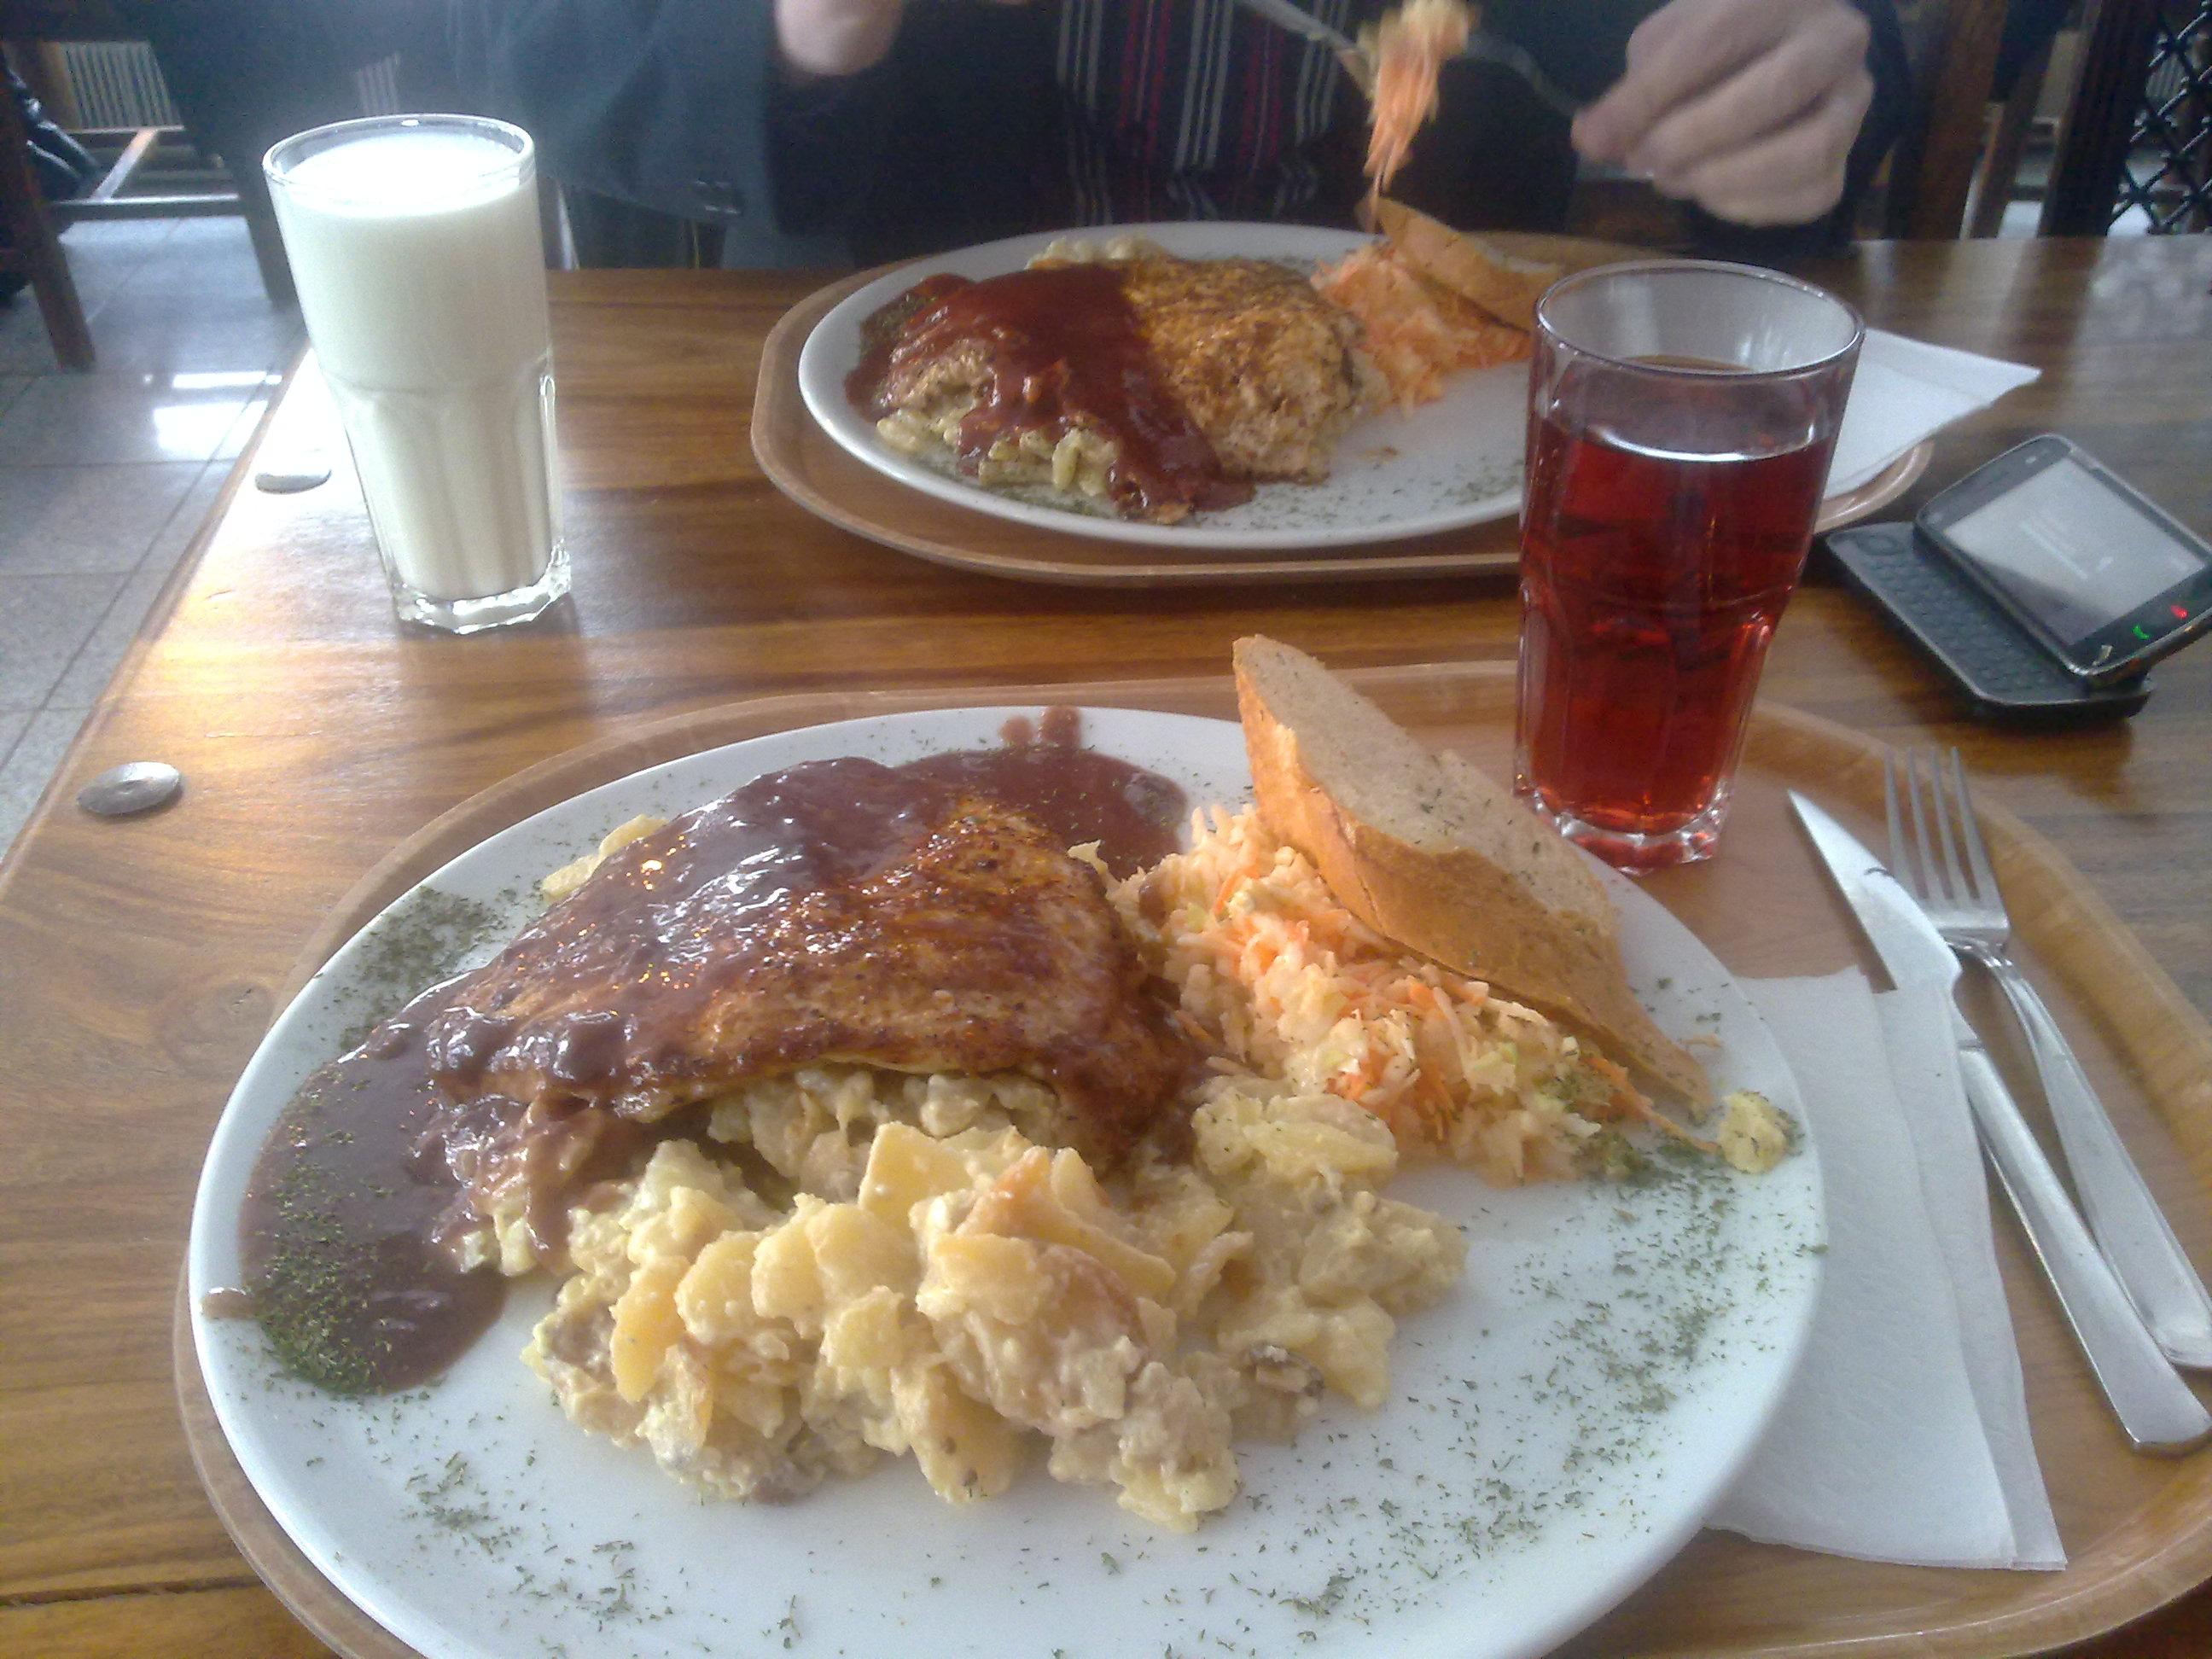 Pihvitupa Viikinki, Joensuu: 200g porsaan-fileepihvi + auraperunat + punaviinik